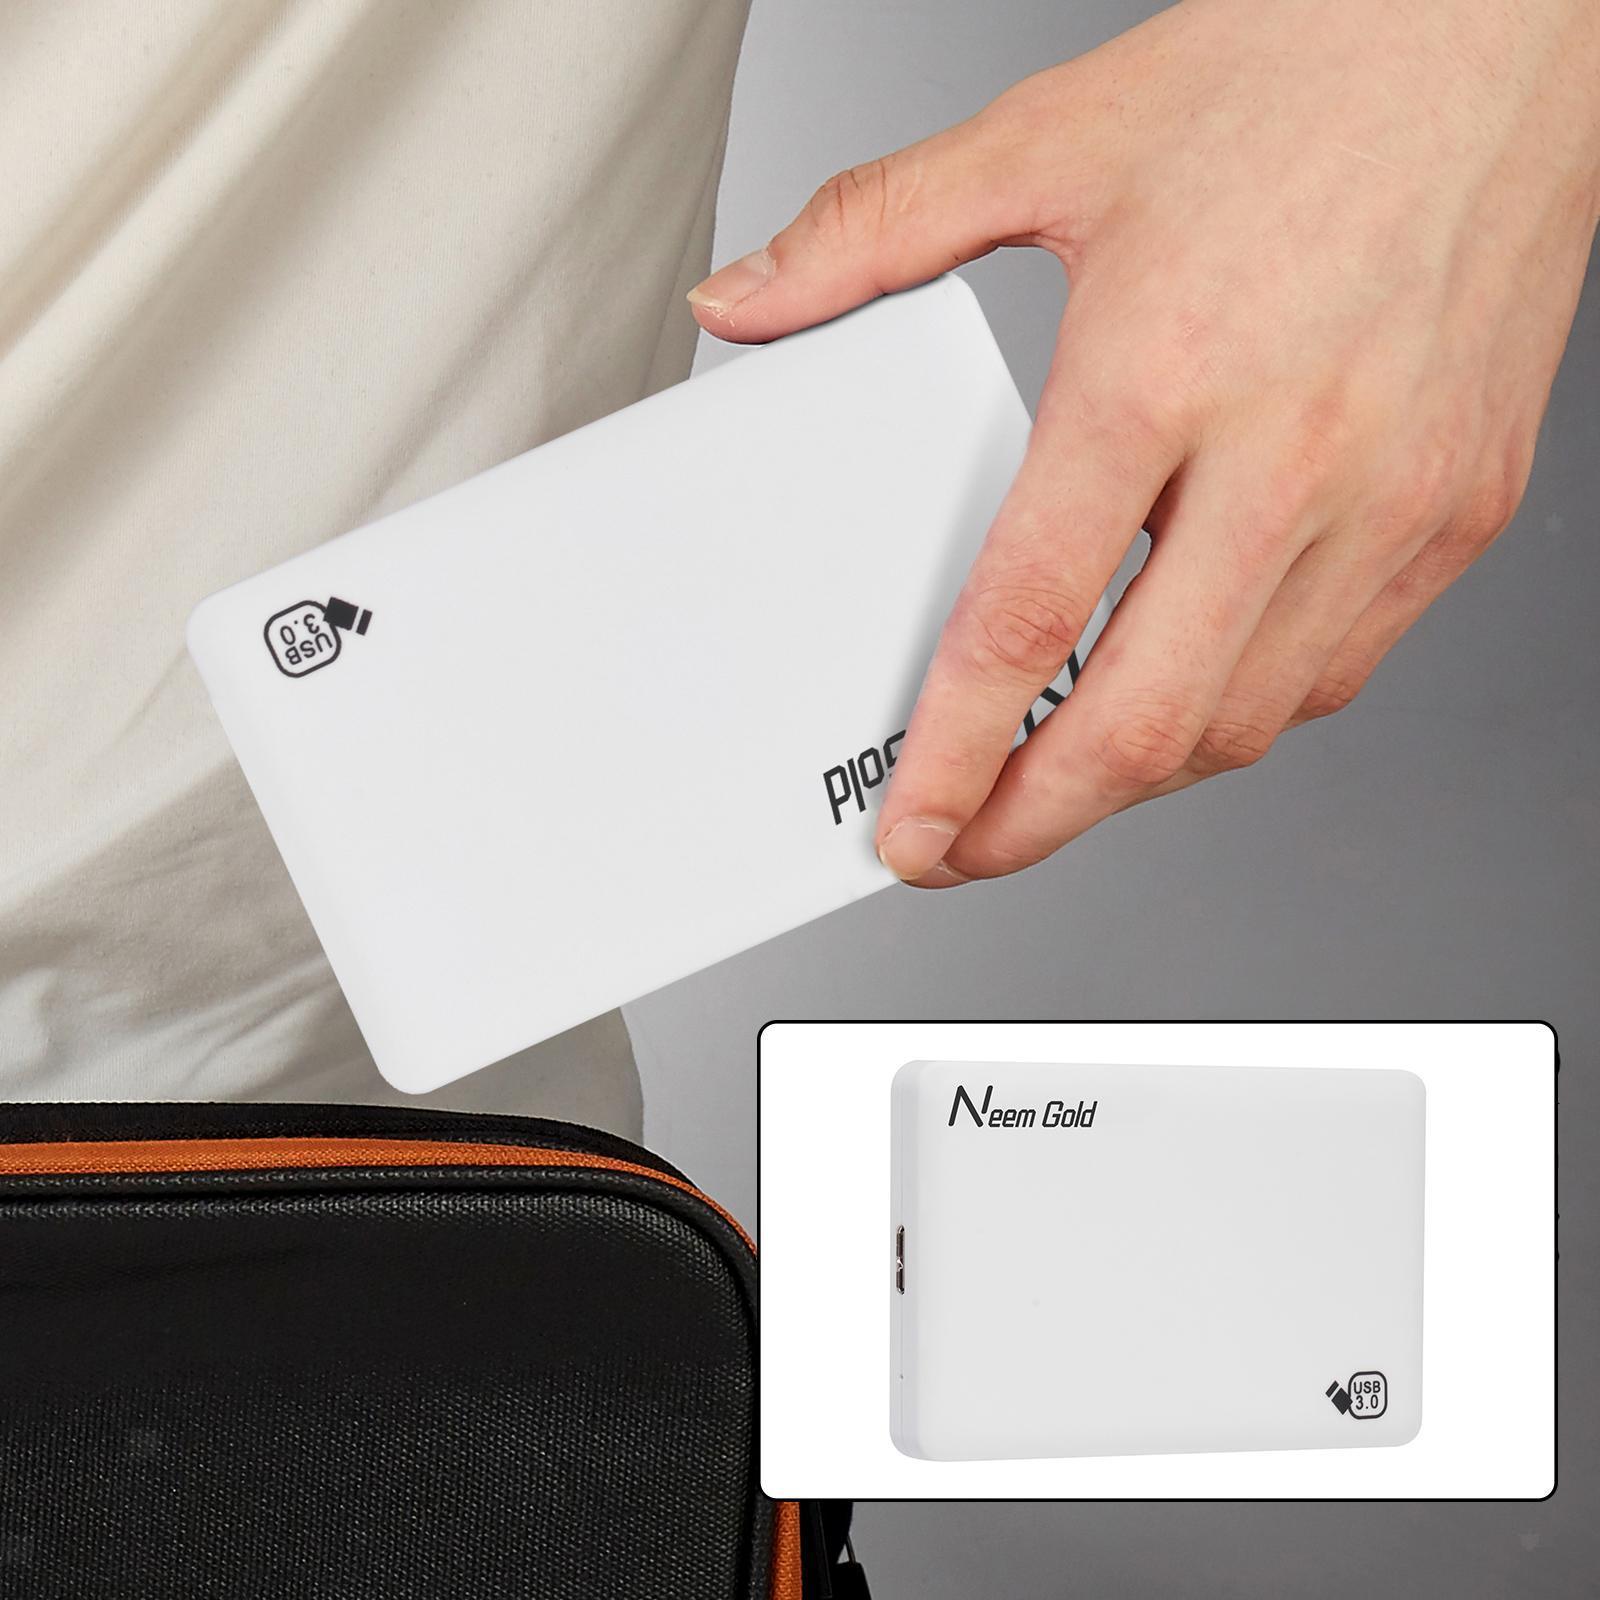 miniature 24 - ABS External Portable USB 3.0 Hard Drive Disk HDD for Desktop Laptop New